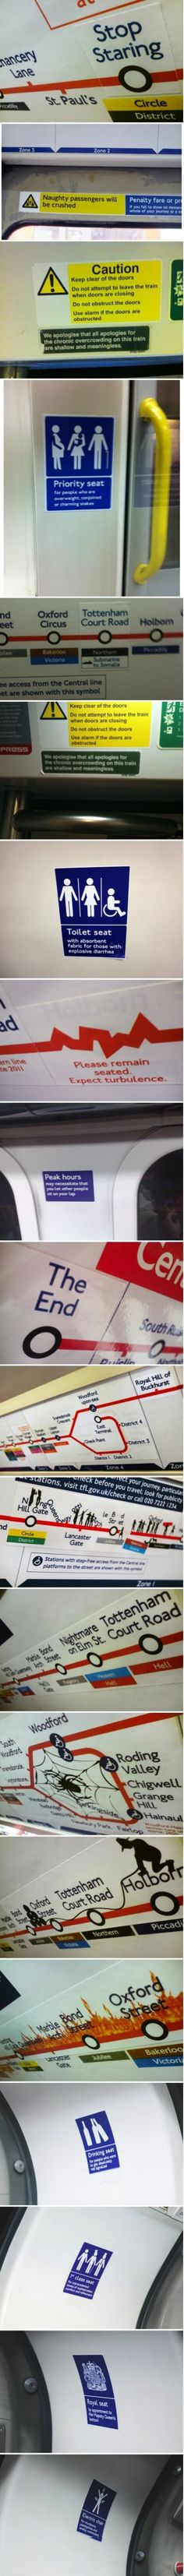 Trolling on the London Underground,